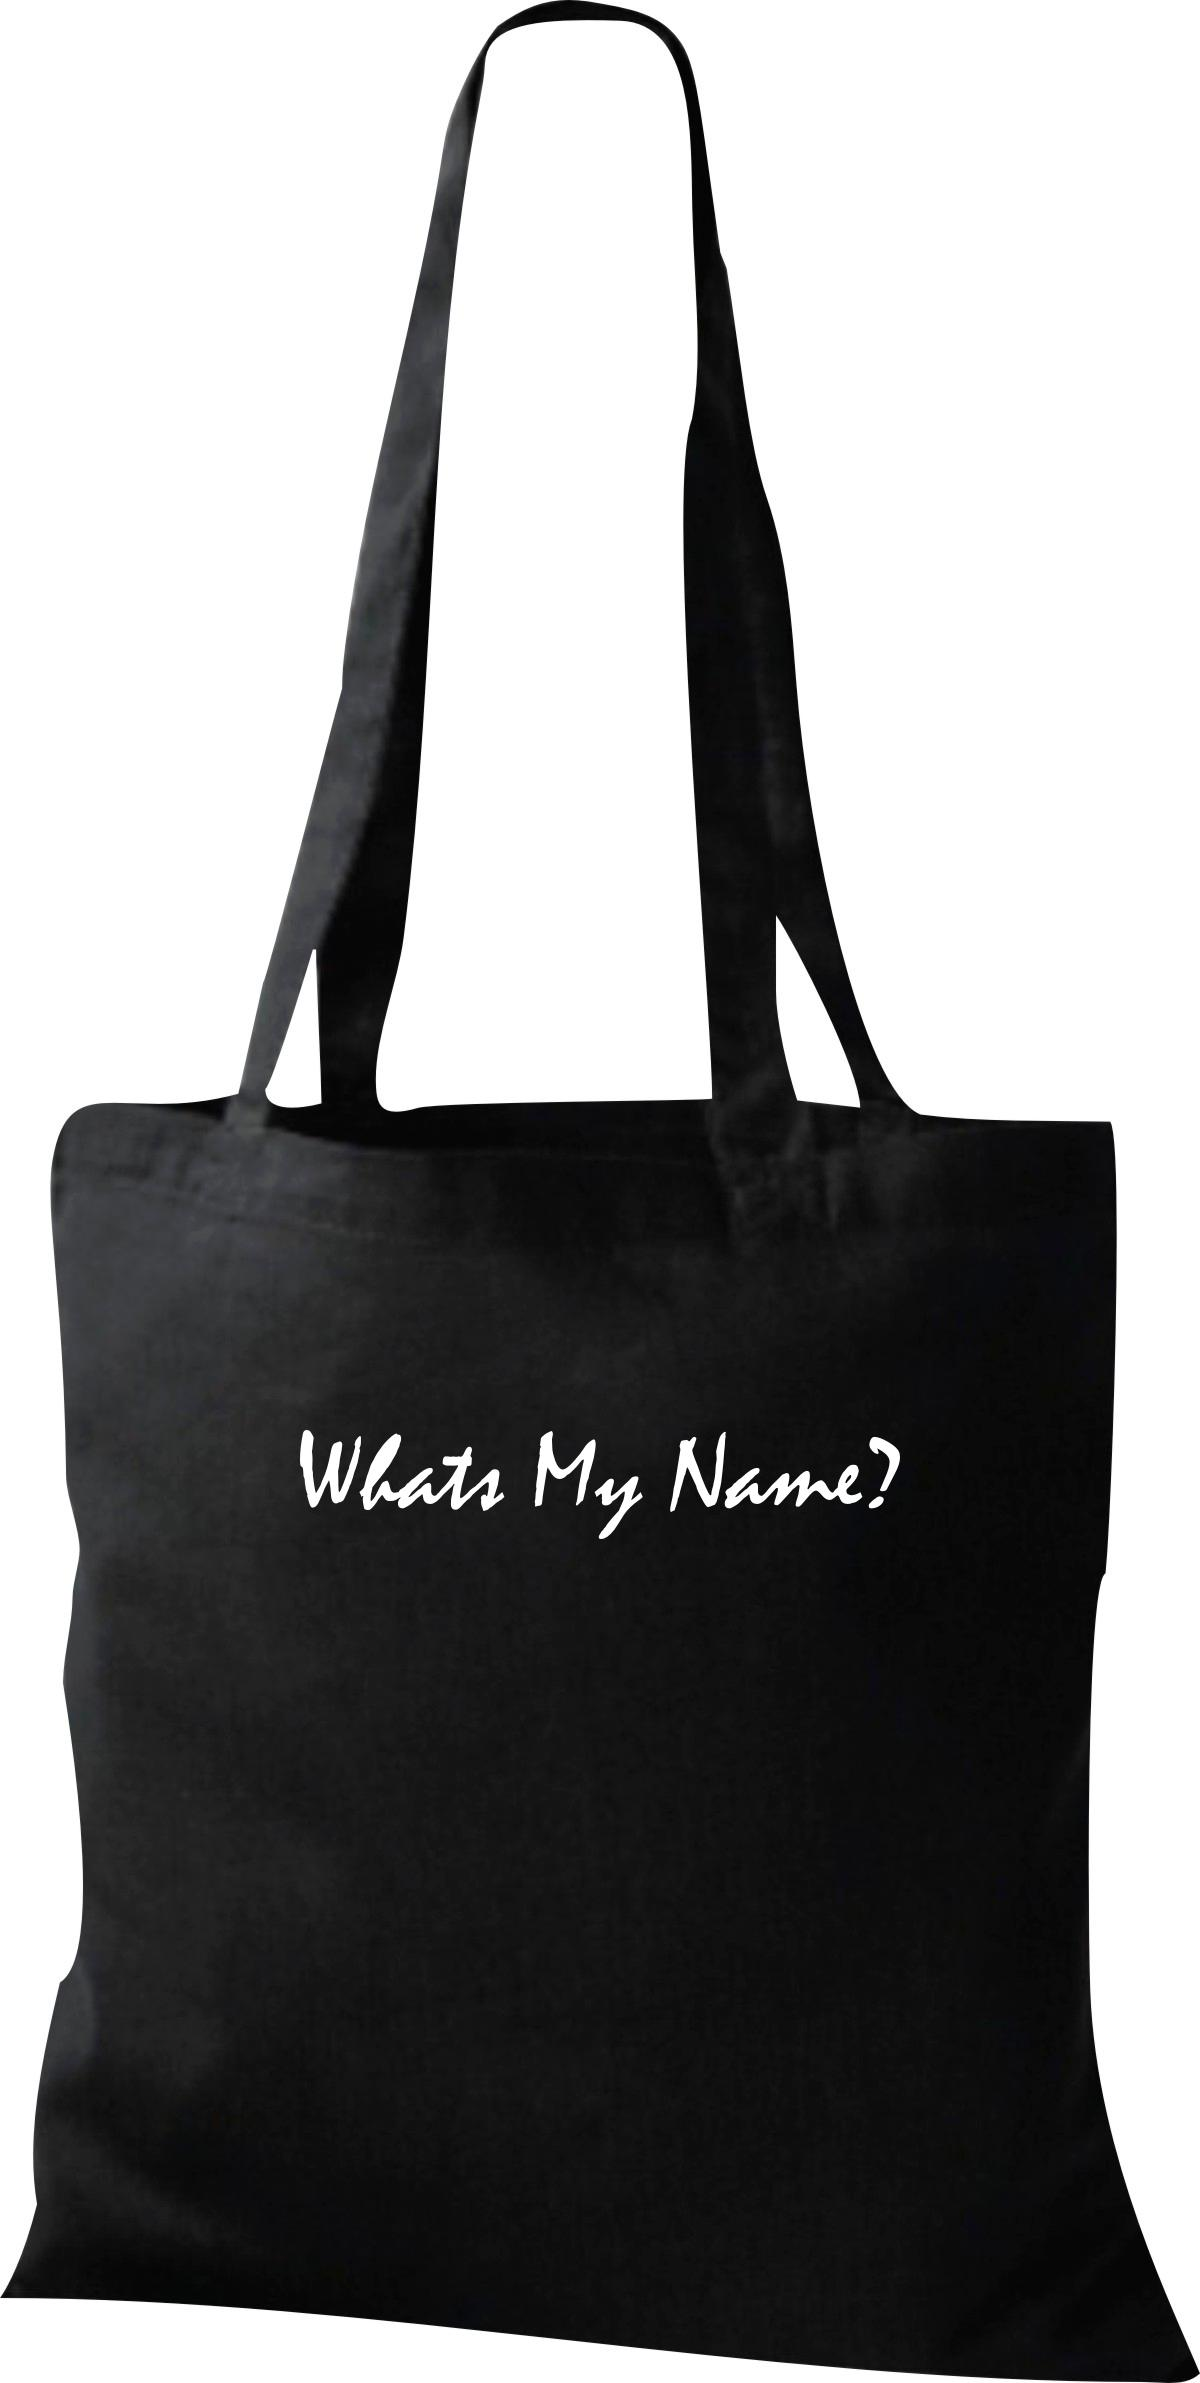 Organic-Bag-Shopper-Whats-My-Name-Cook